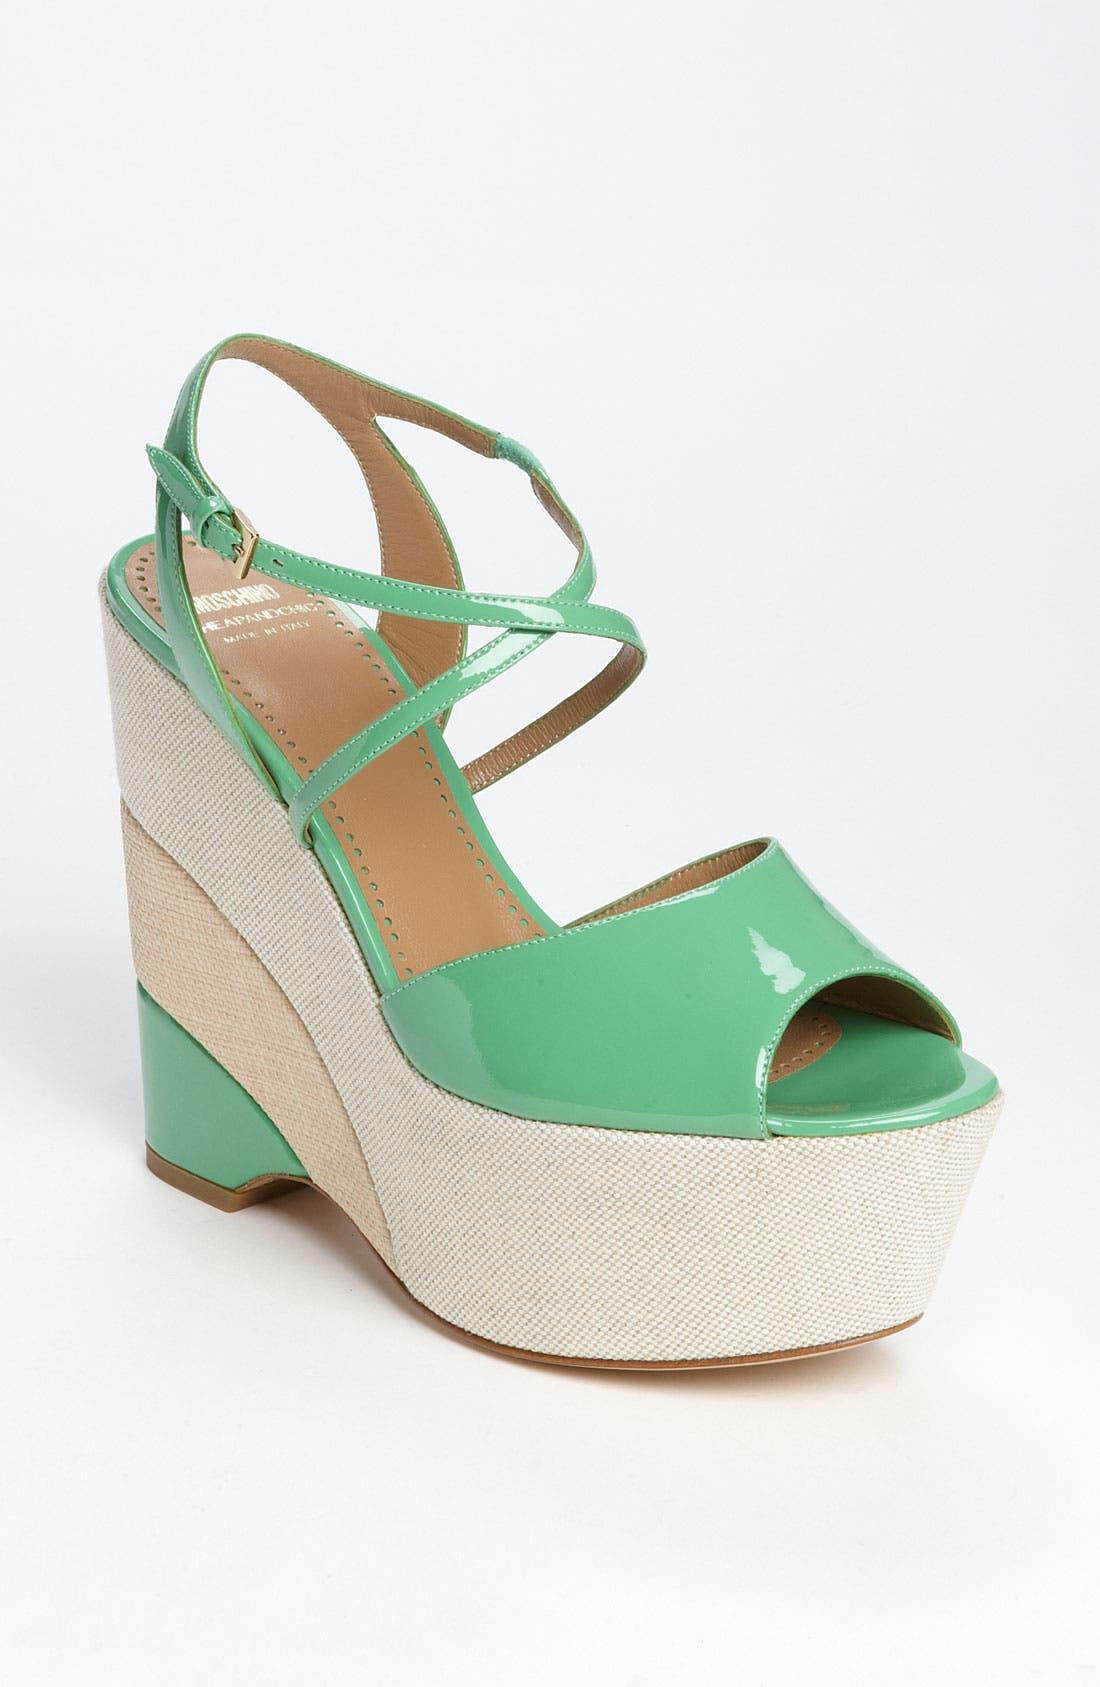 Cheap & Chic Sandal,                         Main,                         color, 300